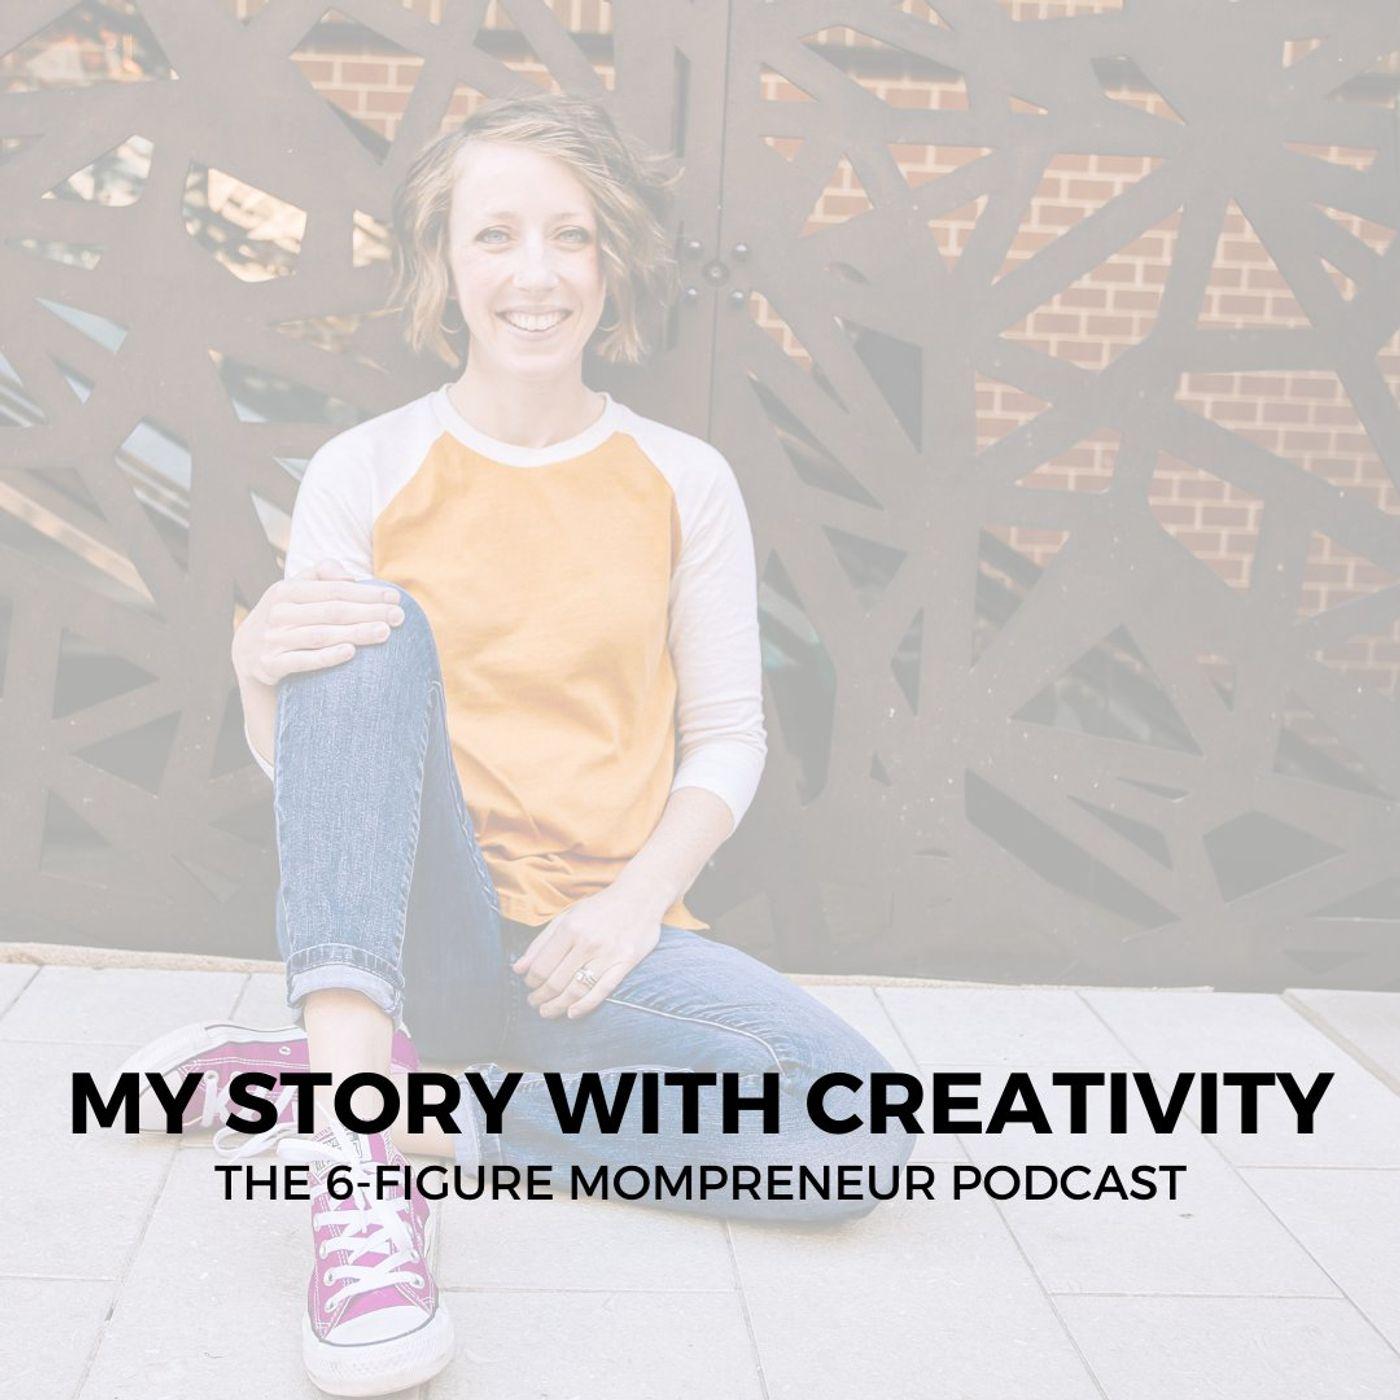 My story with creativity